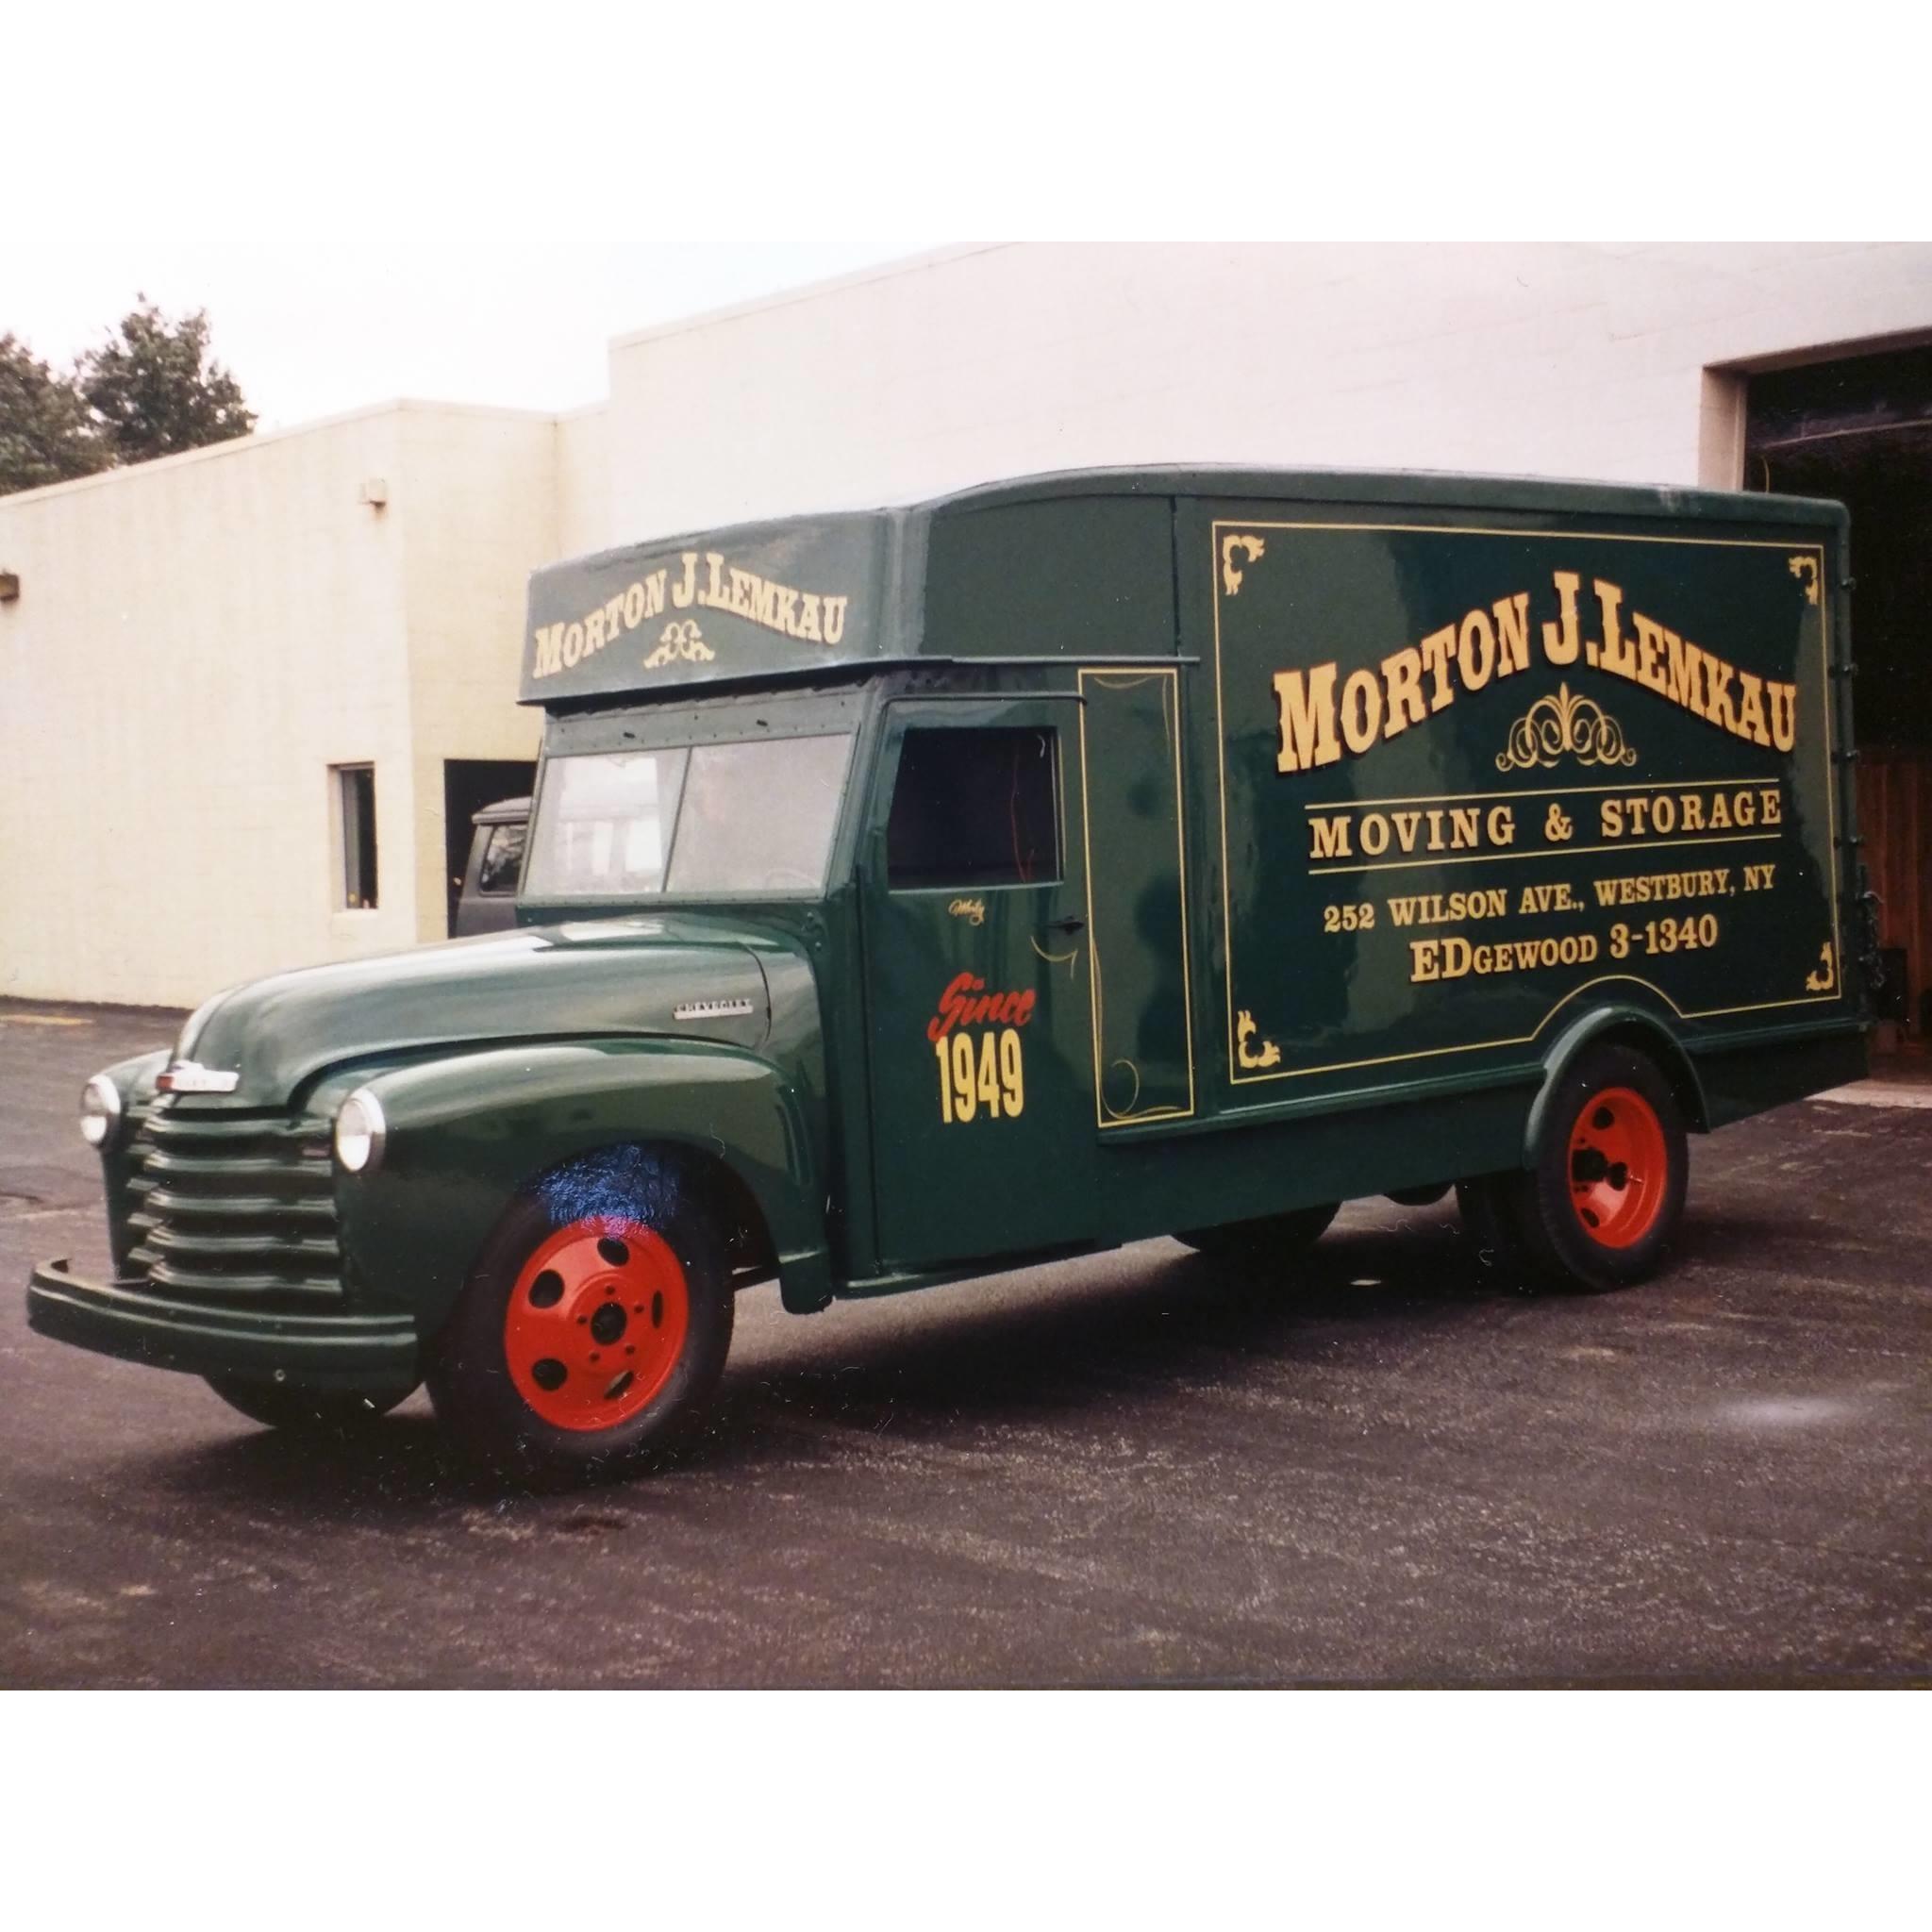 Morton Lemkau Moving & Storage image 9